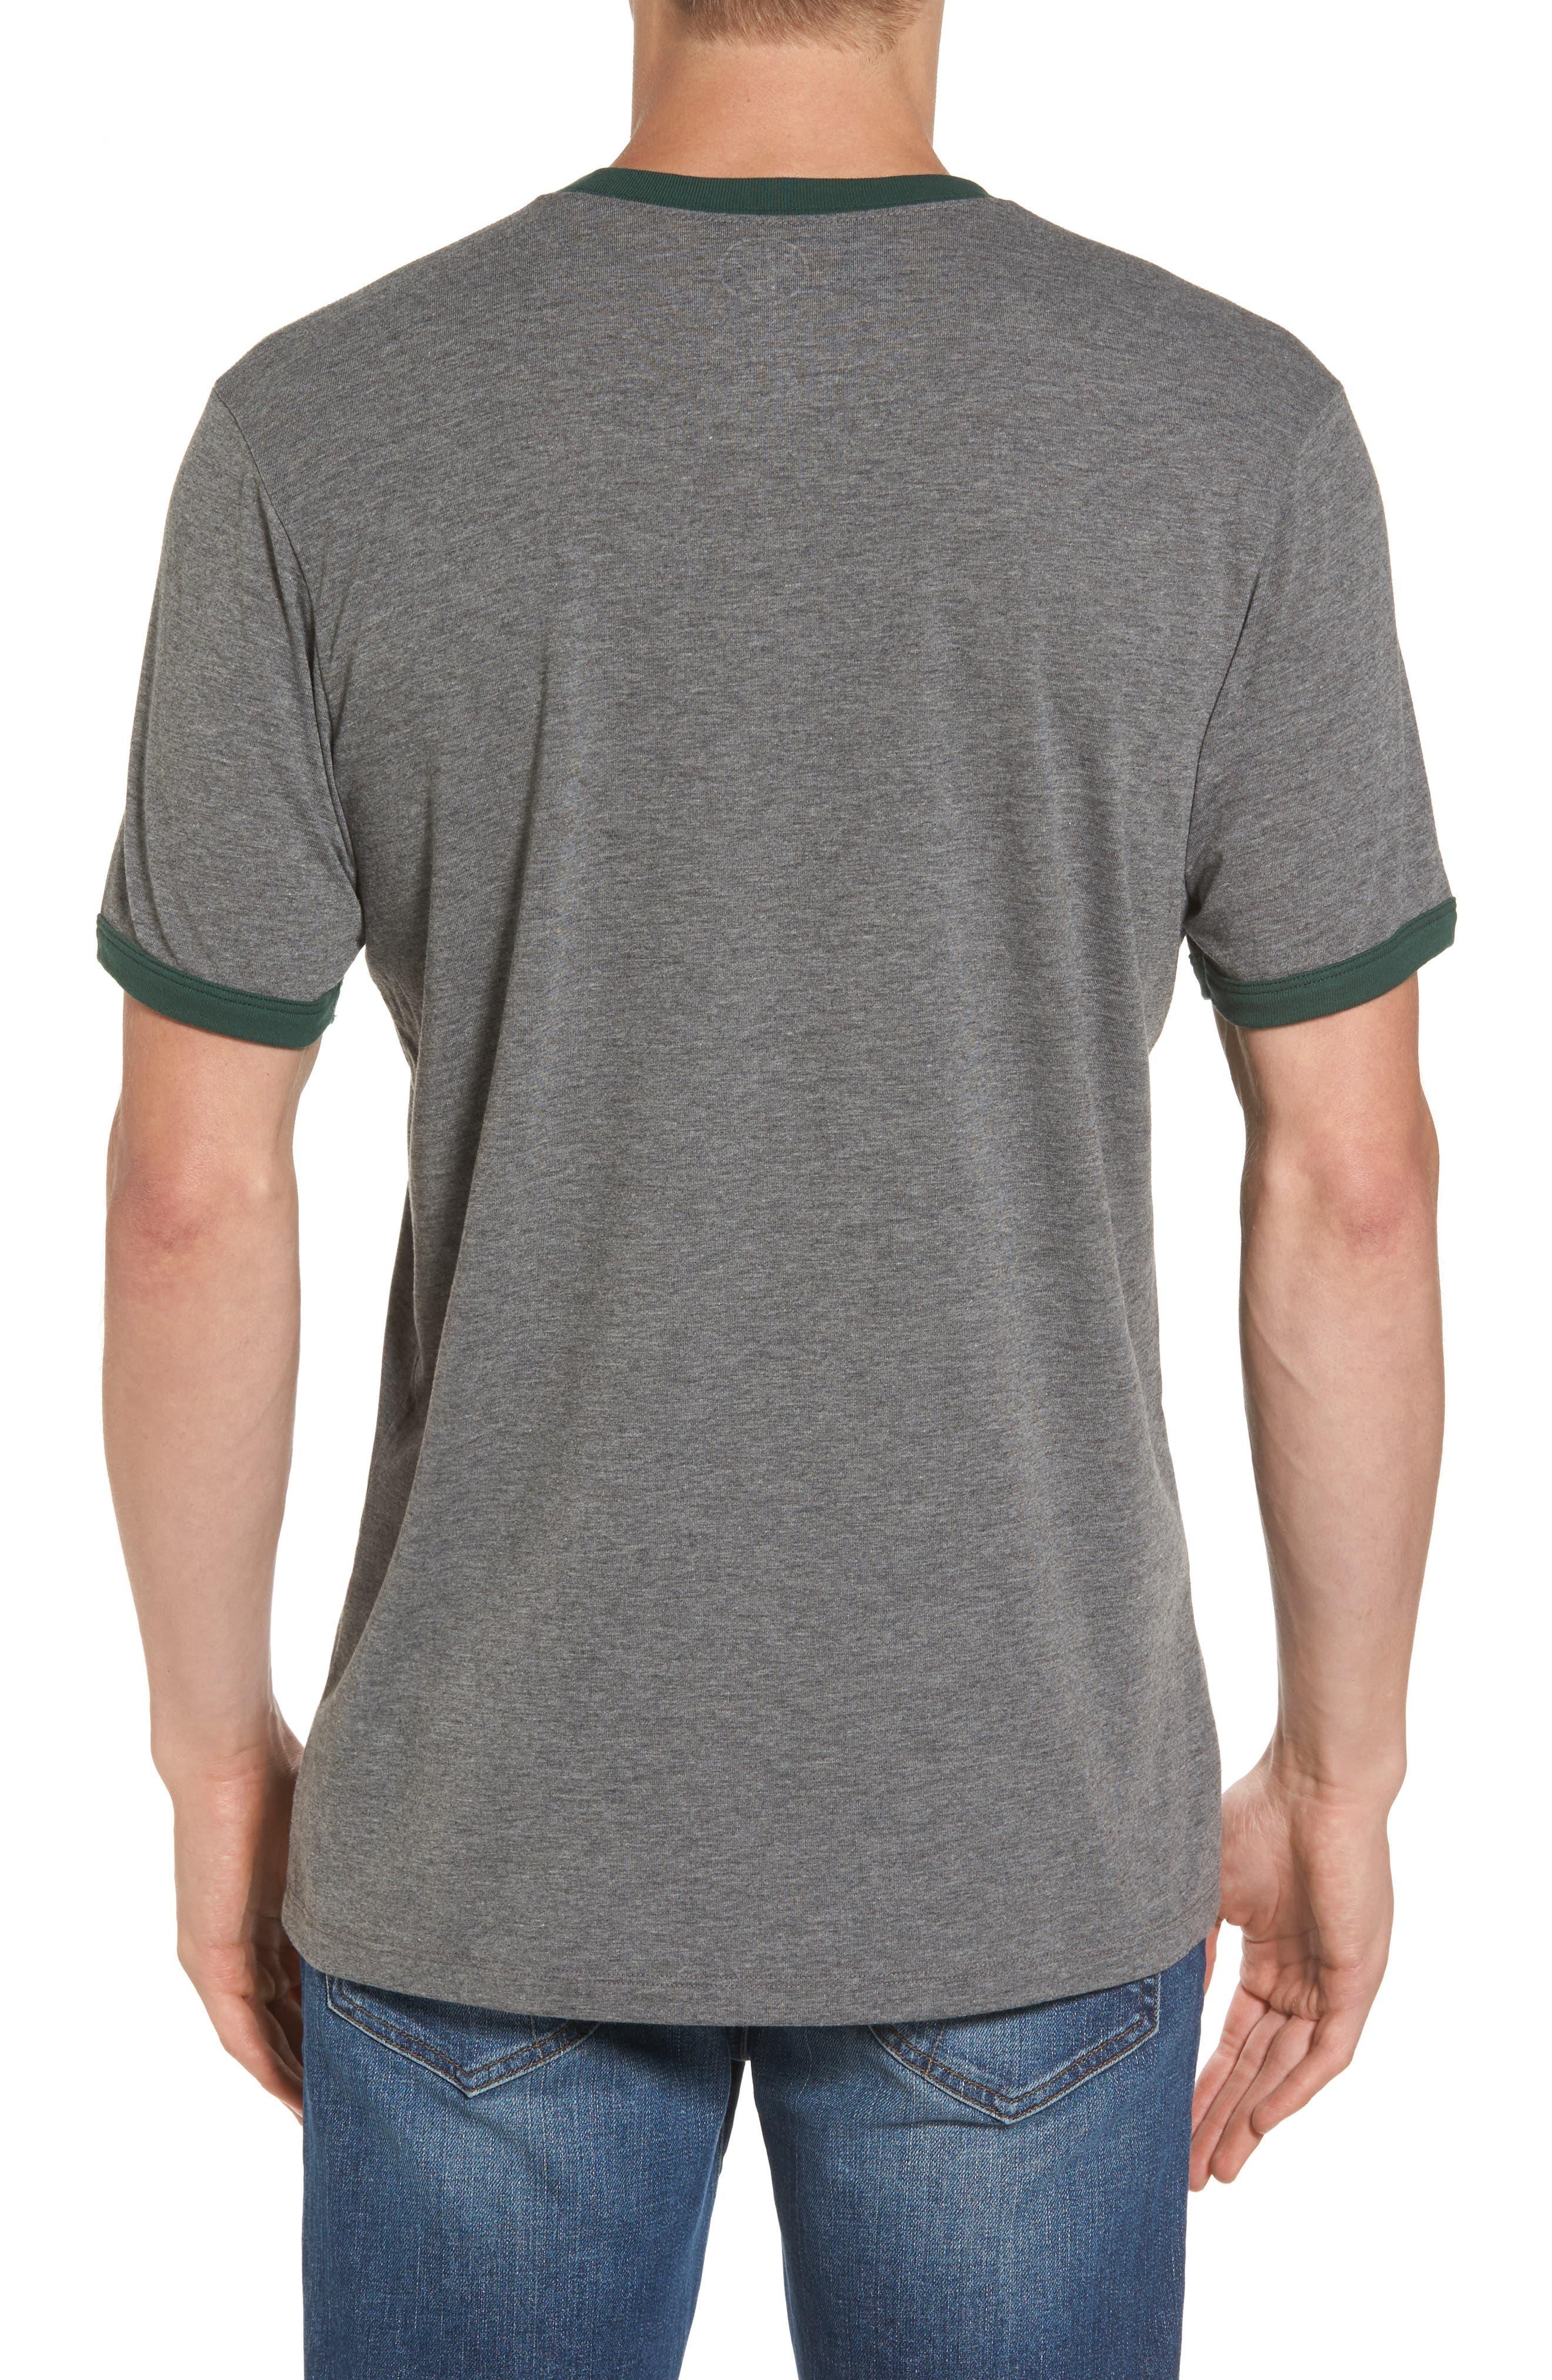 Green Bay Packers Ringer T-Shirt,                             Alternate thumbnail 2, color,                             021